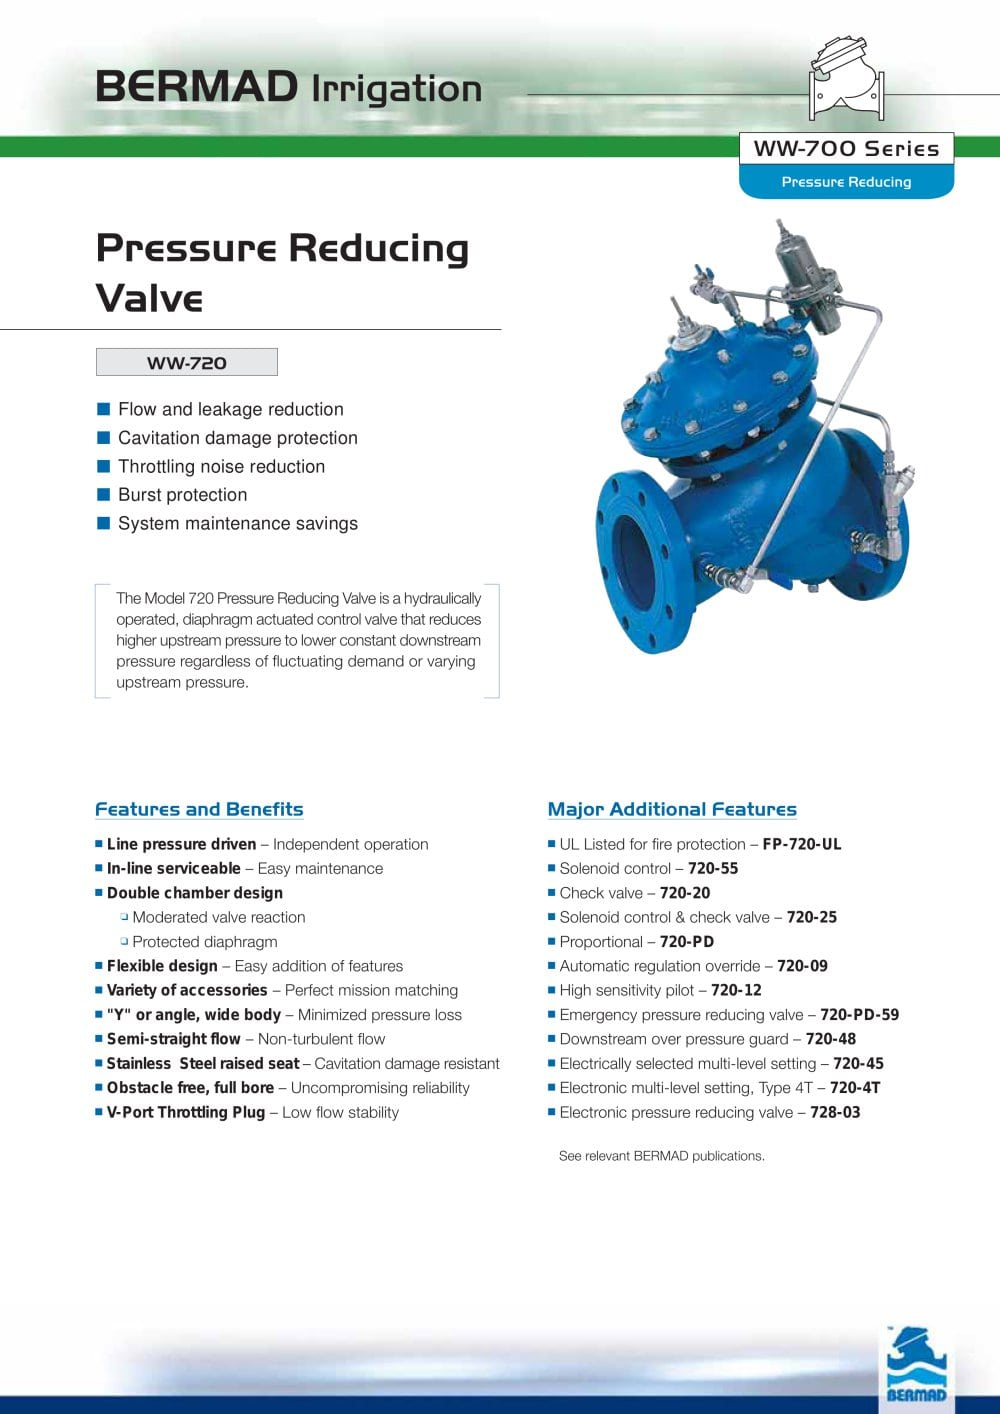 Ww 720 bermad pdf catalogue technical documentation brochure ww 720 1 4 pages nvjuhfo Choice Image